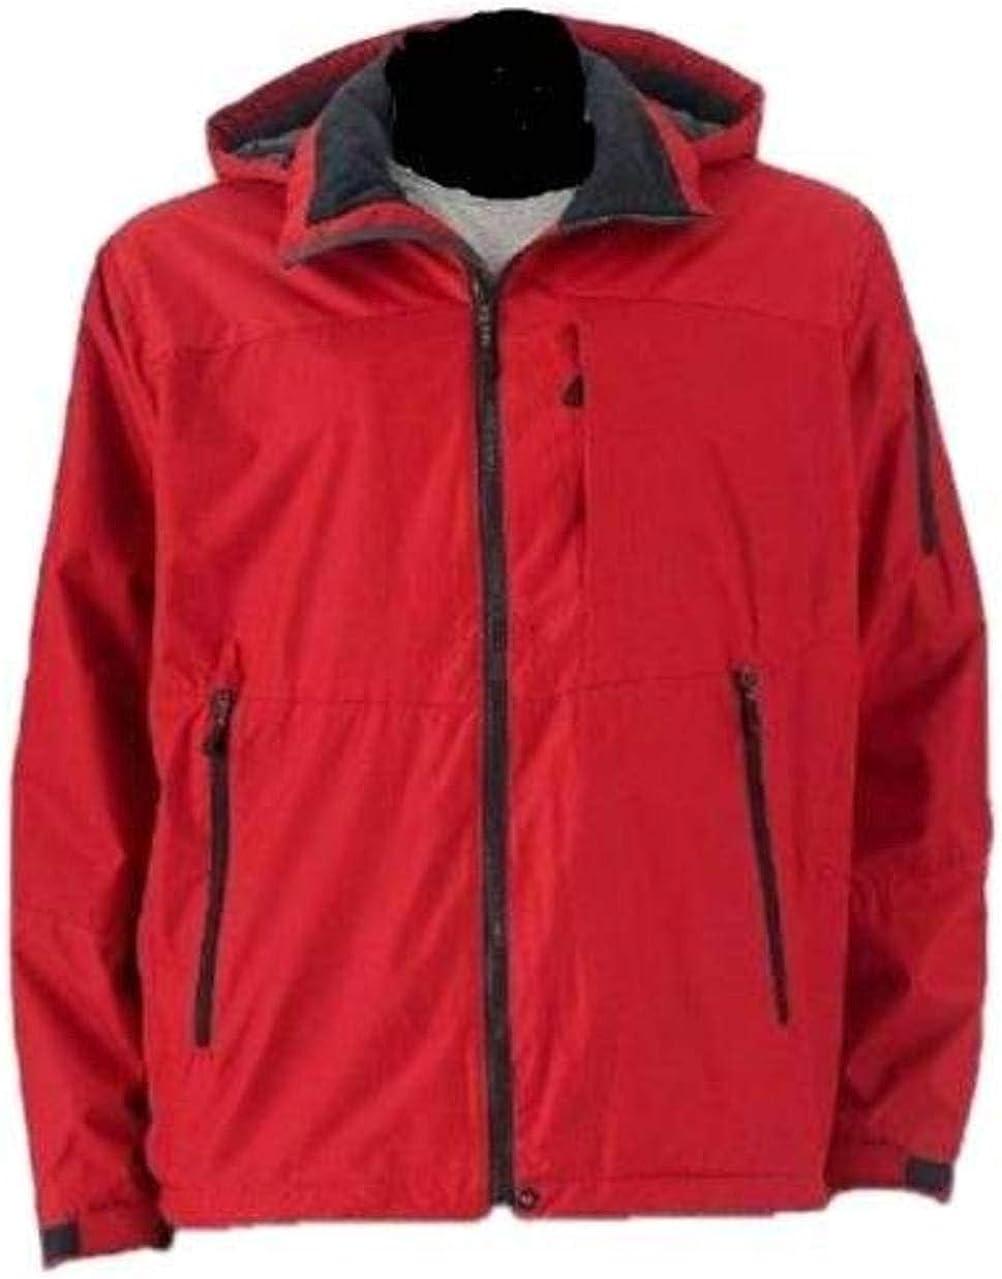 Hemisphere Men's Fleece Lined Water Resistant Hooded Winter Down Jacket